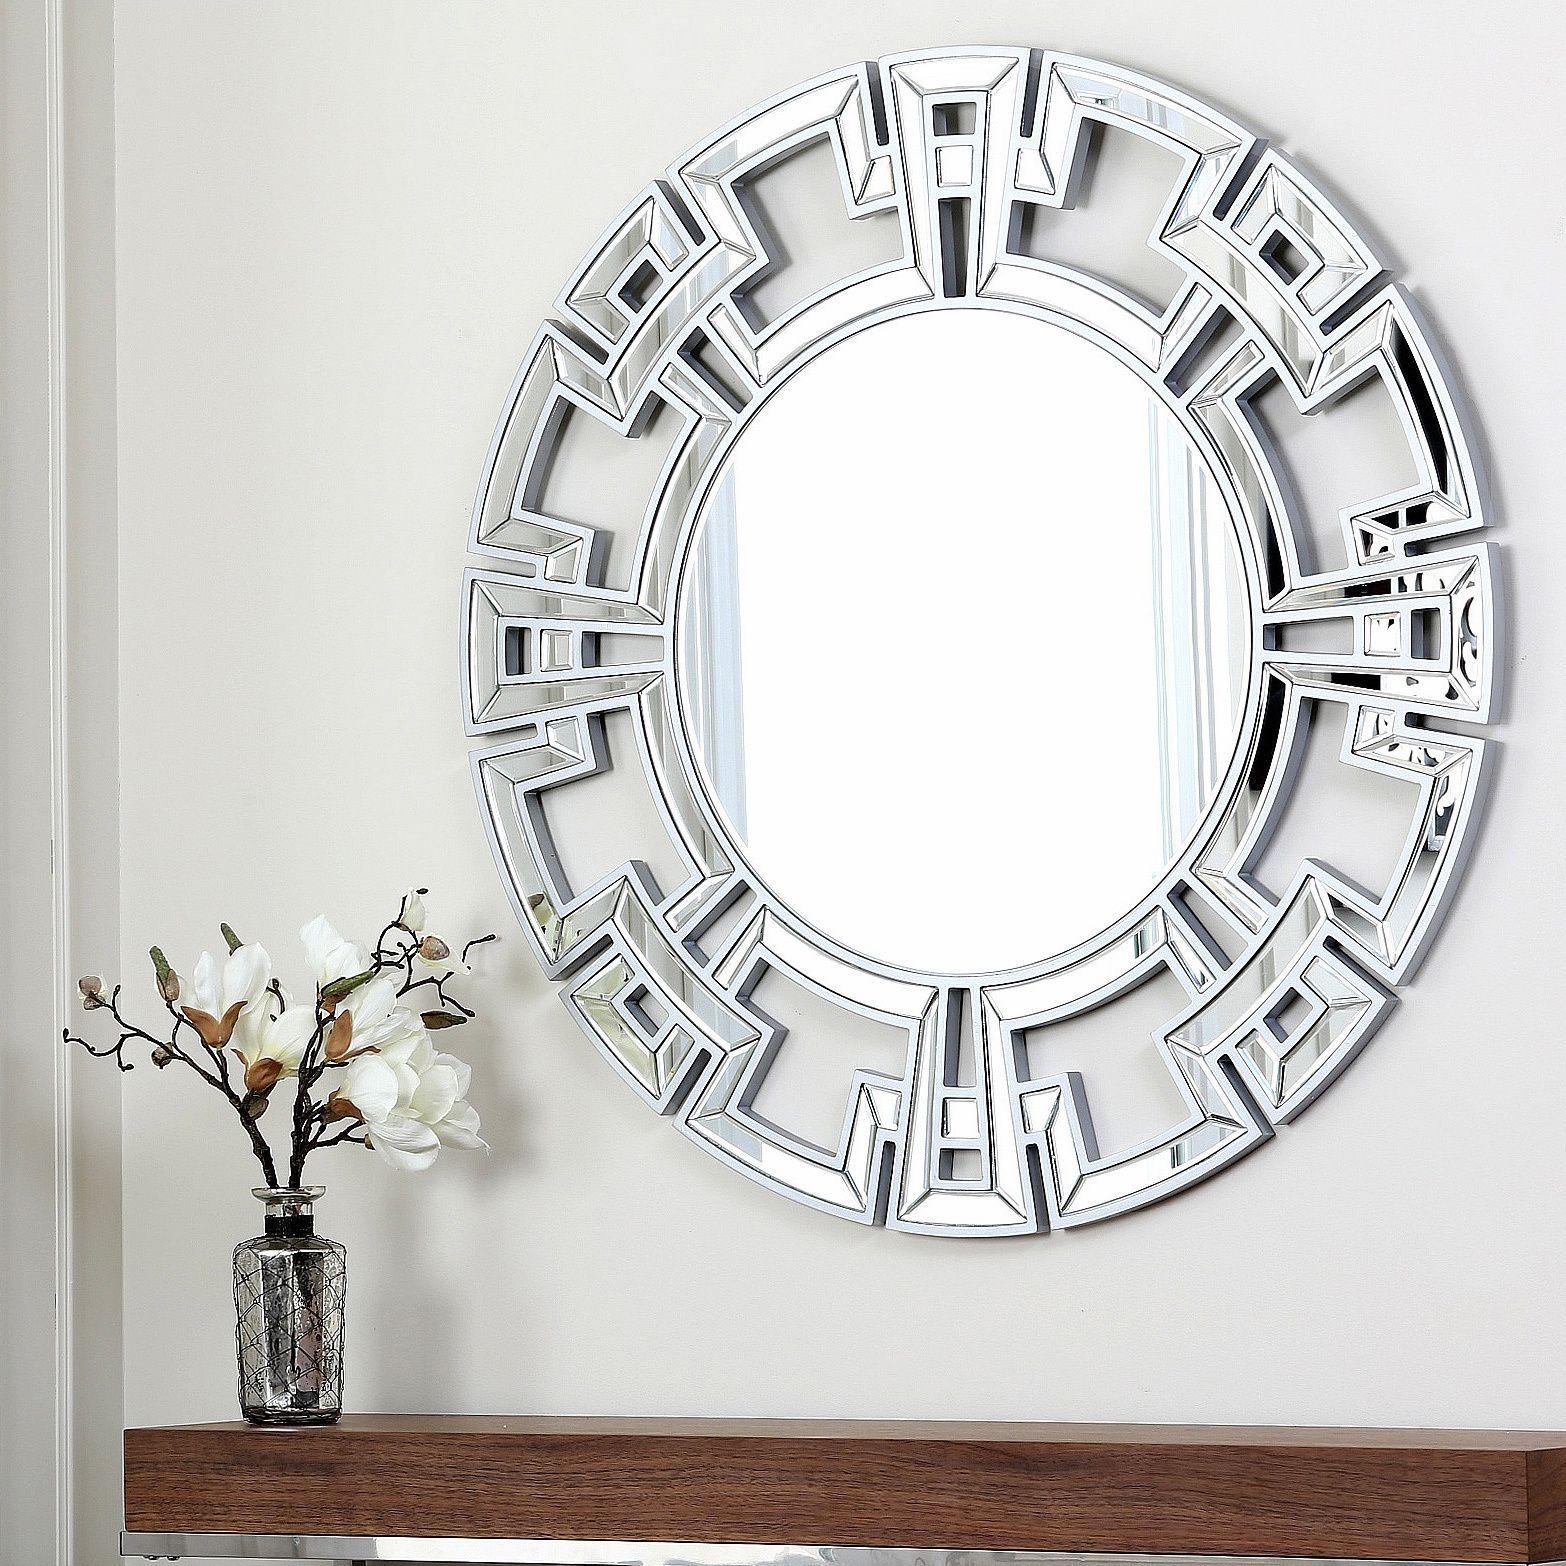 Abbyson pierre silver round wall mirror mirror construction abbyson pierre silver round wall mirror mirror amipublicfo Images